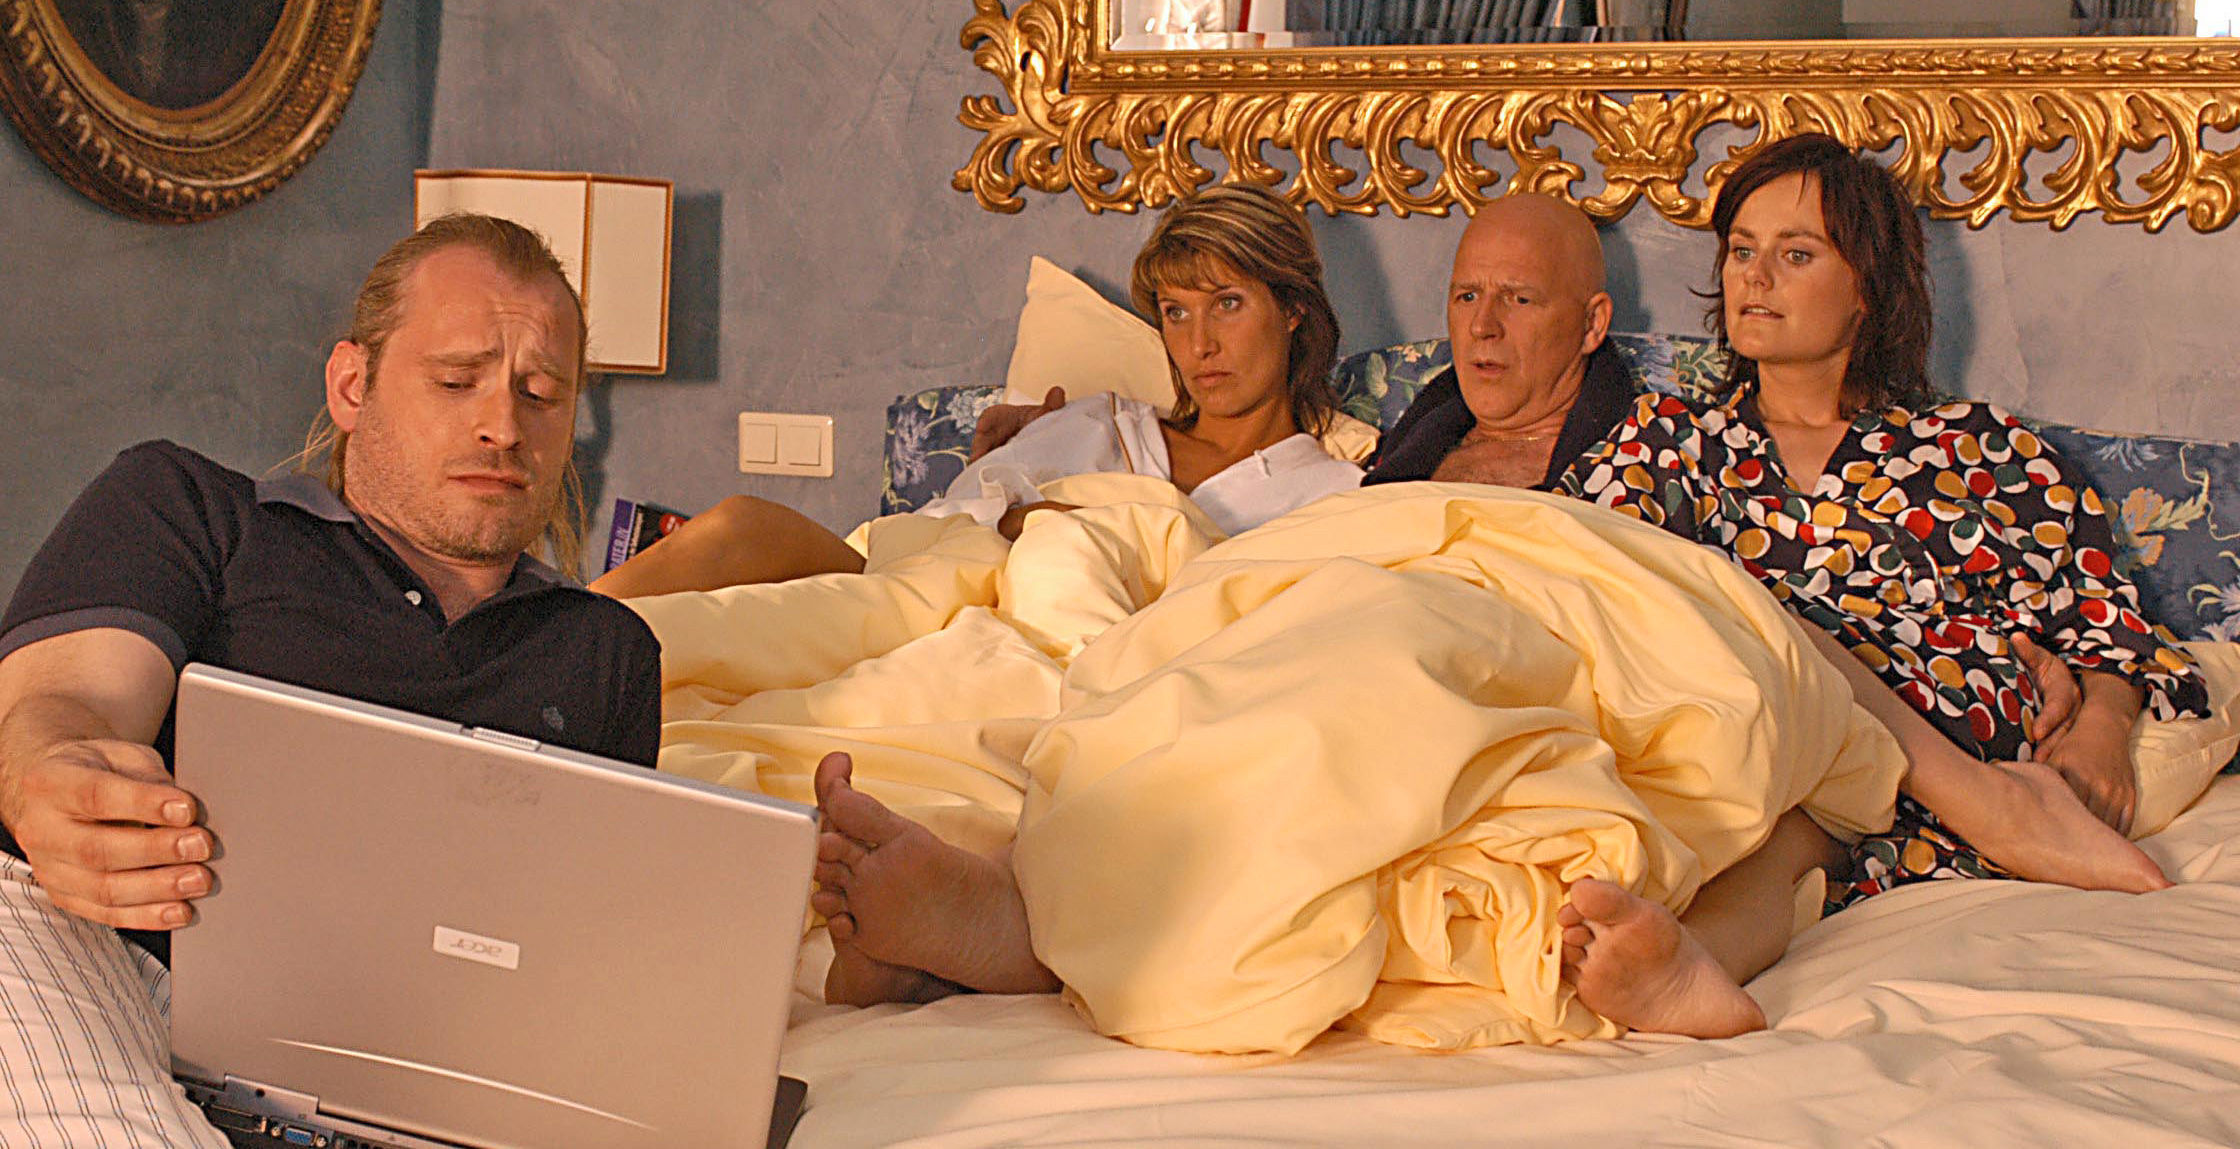 Rene (Johannes Krisch), Suzie (Ina Nadine Wagler), Ralph Schuster (Alexander Goebel), Vanessa (Nina Blum)